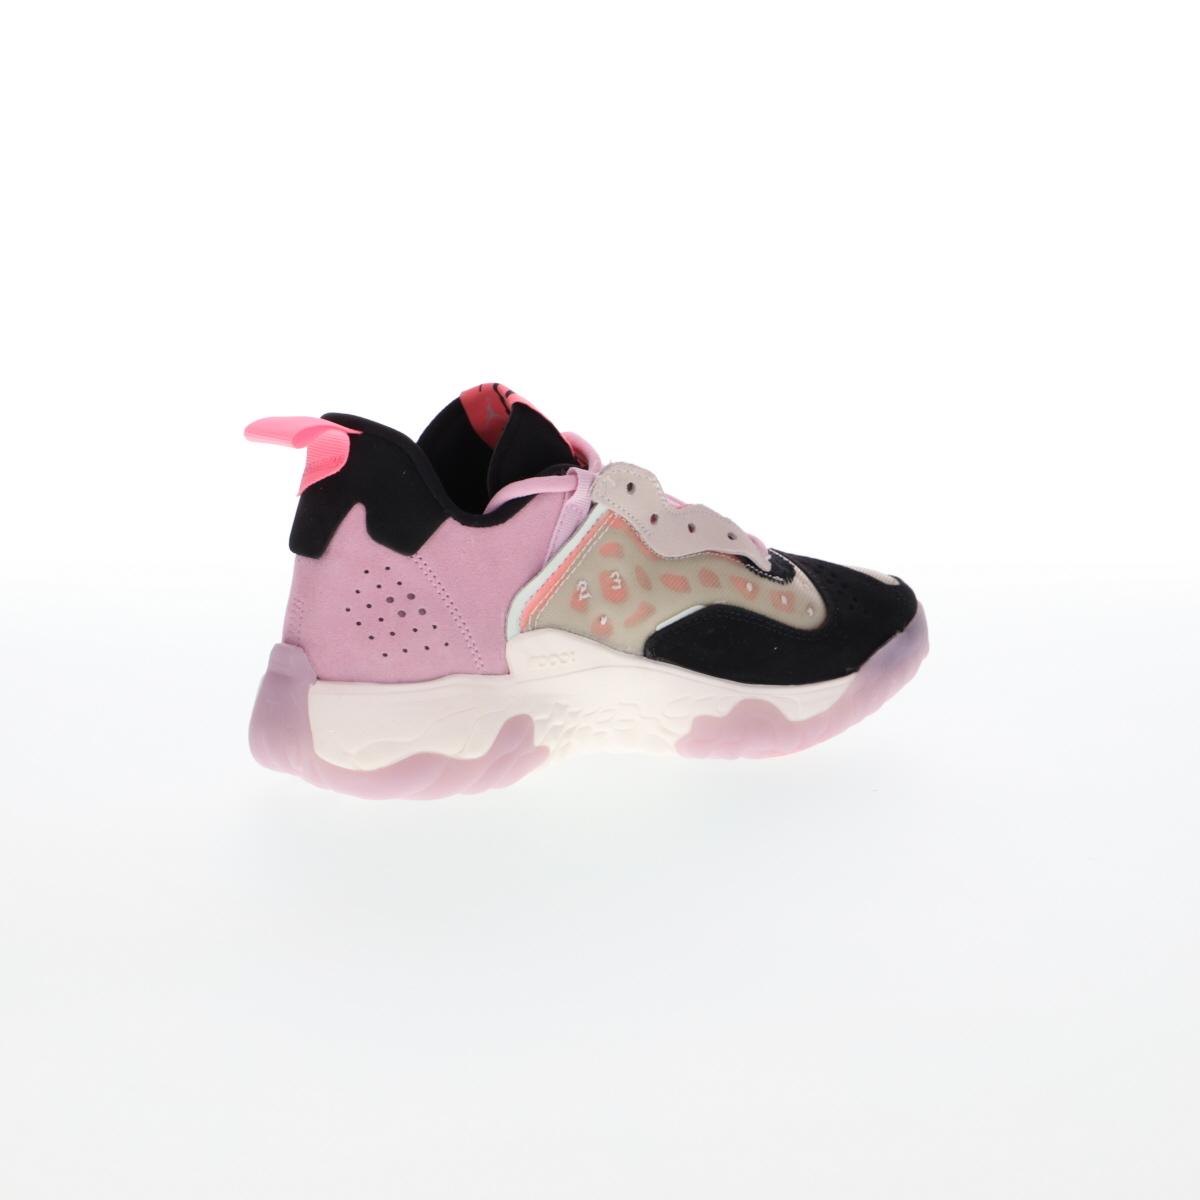 nike vapor speed turf shoes for boys 2017